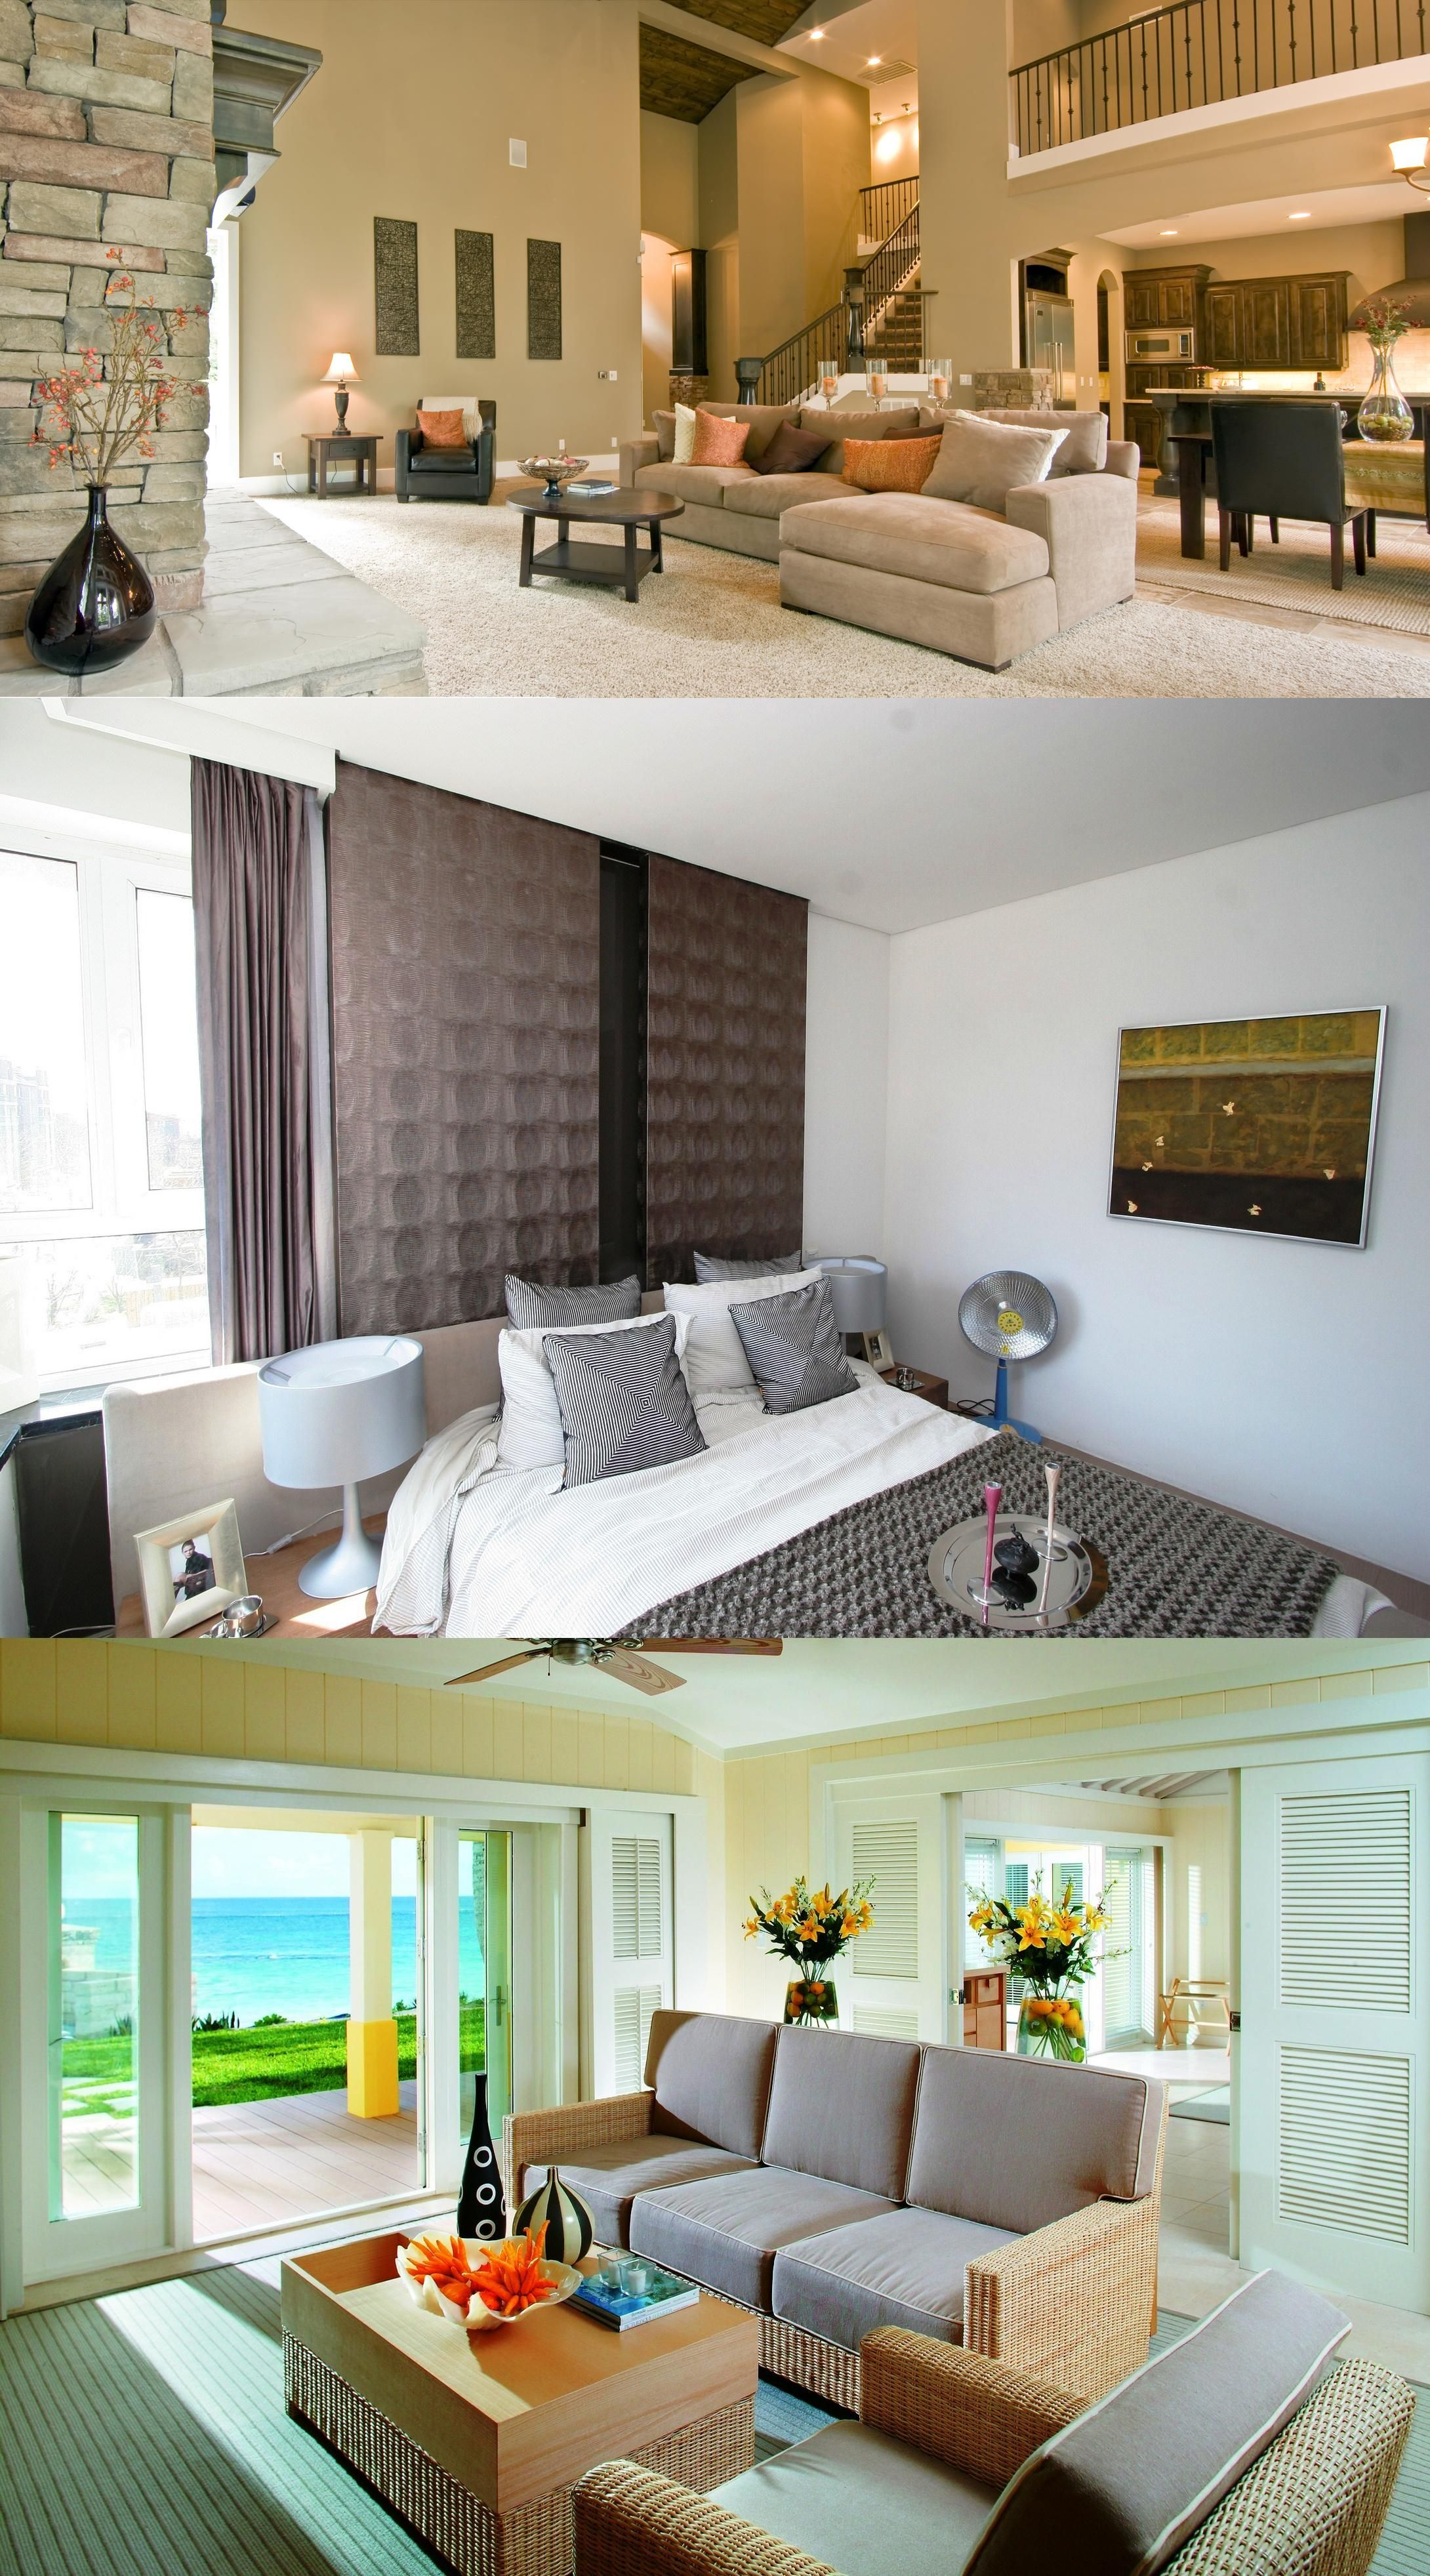 Interior design style home furnishings - Interior Design Style Home Furnishings Furniture Carpets